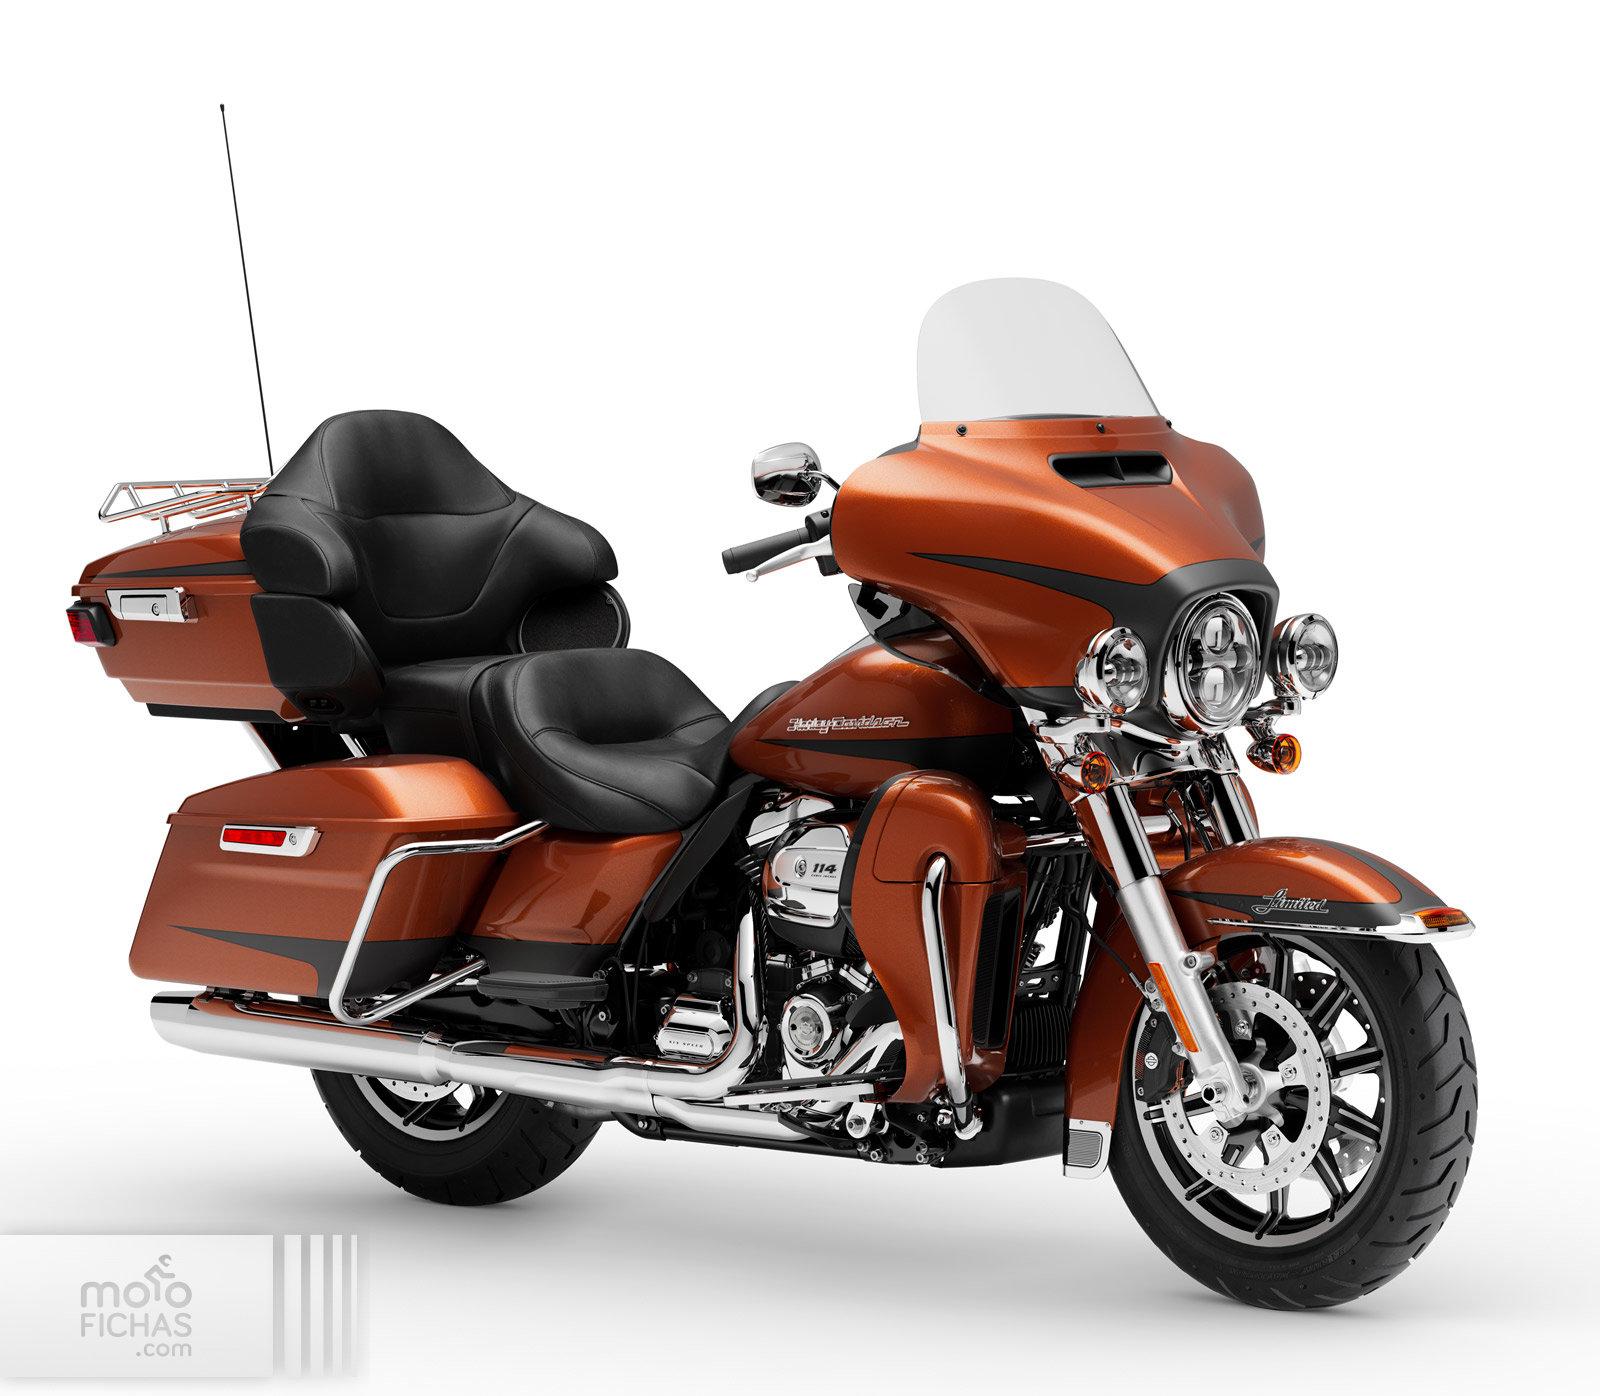 Harley Davidson Ultra Limited  To